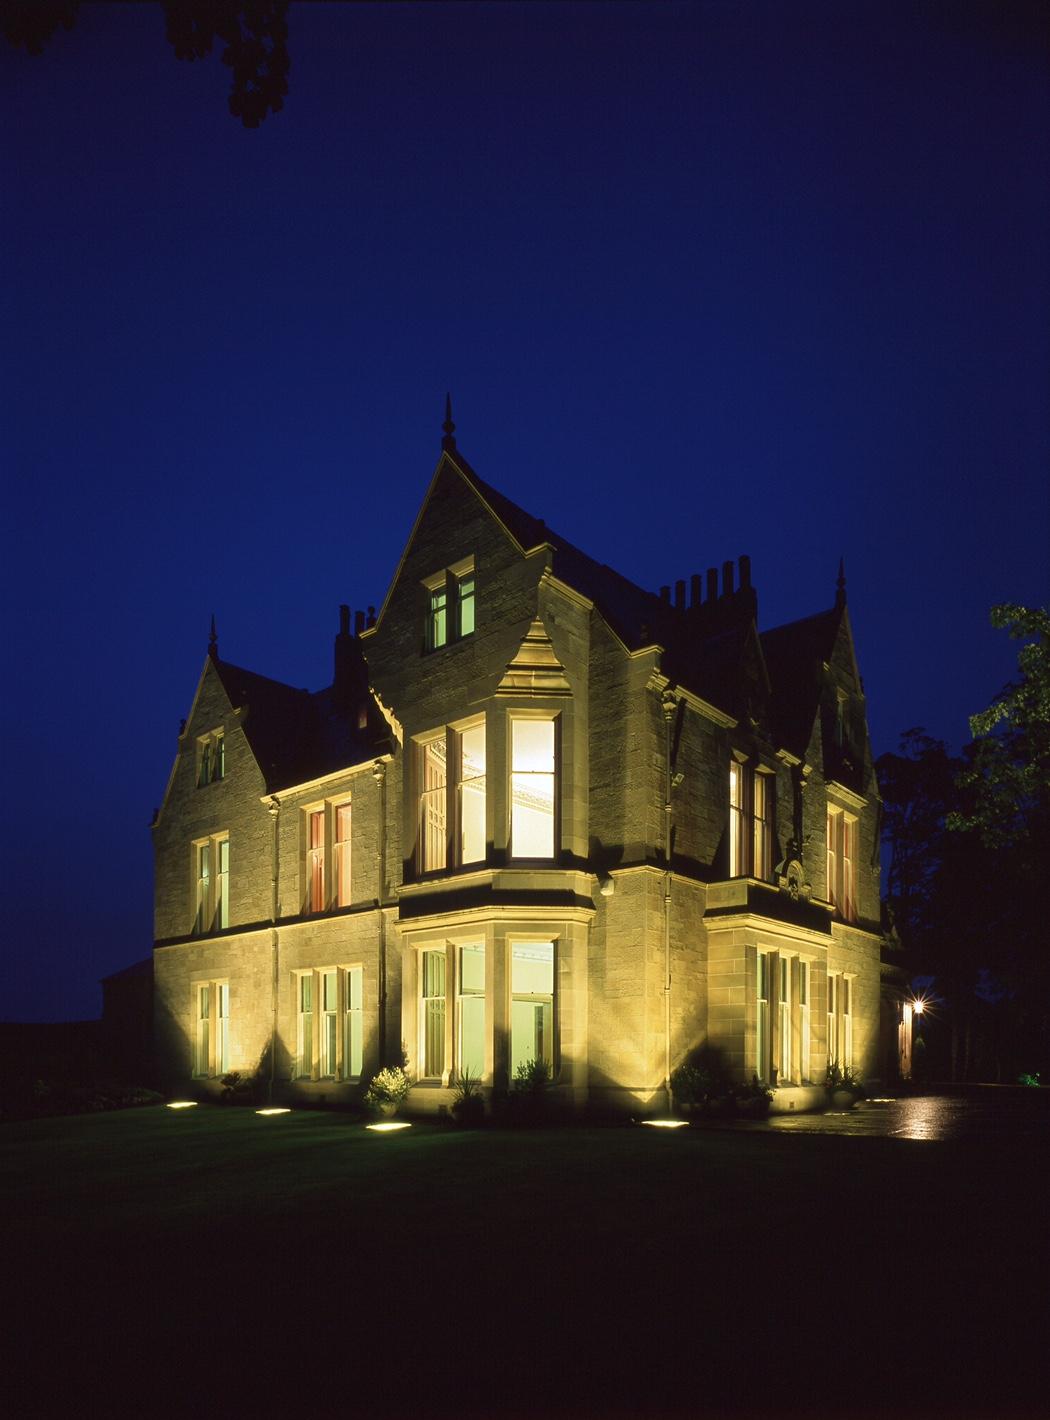 Kirkhill House at night